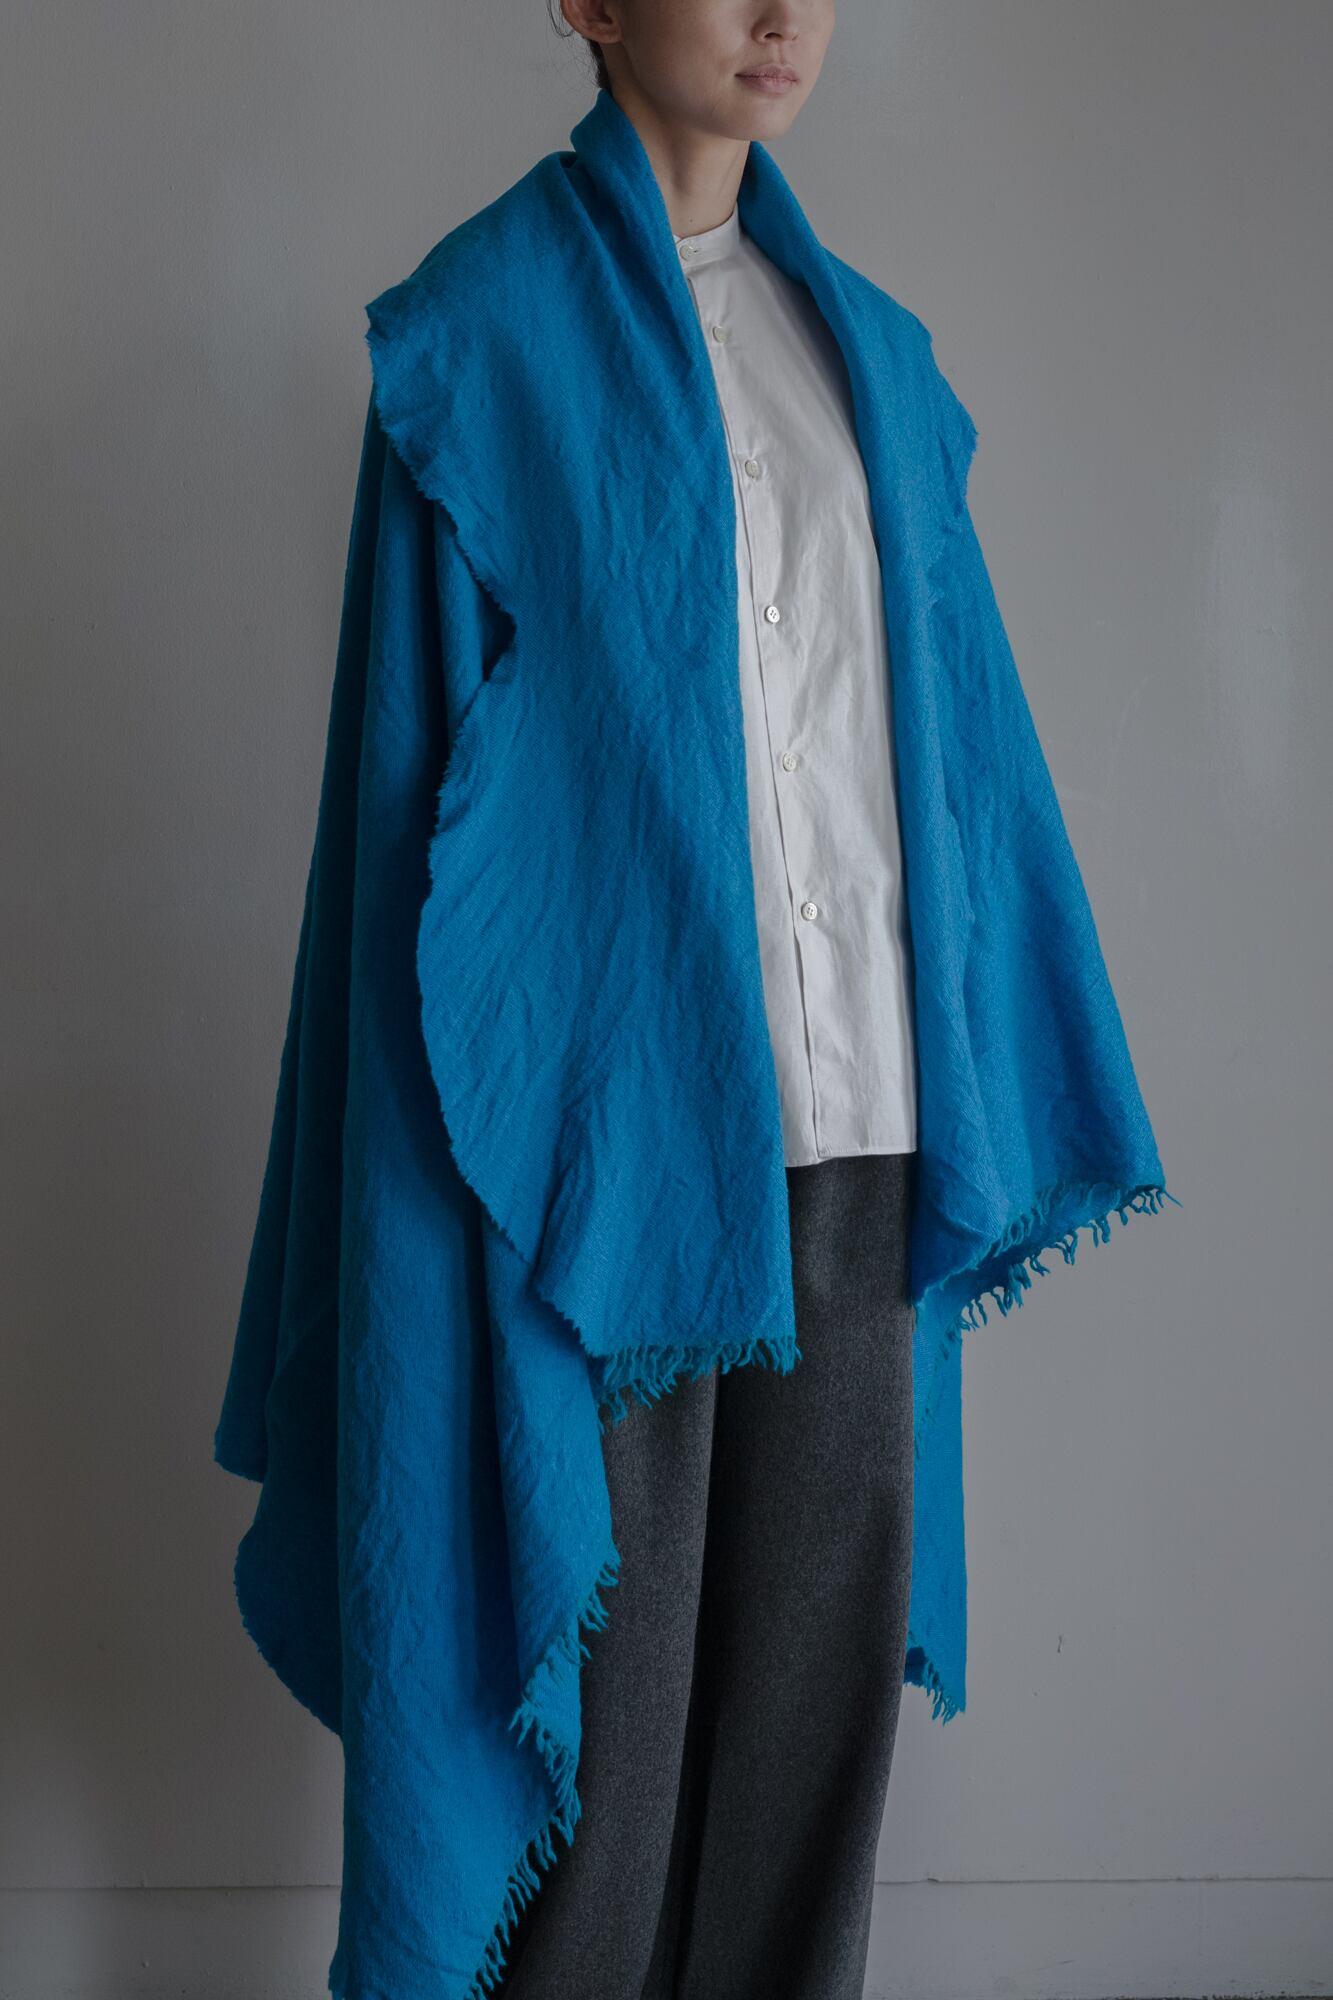 01602-3 chambray cut stole / turquoise,lightblue